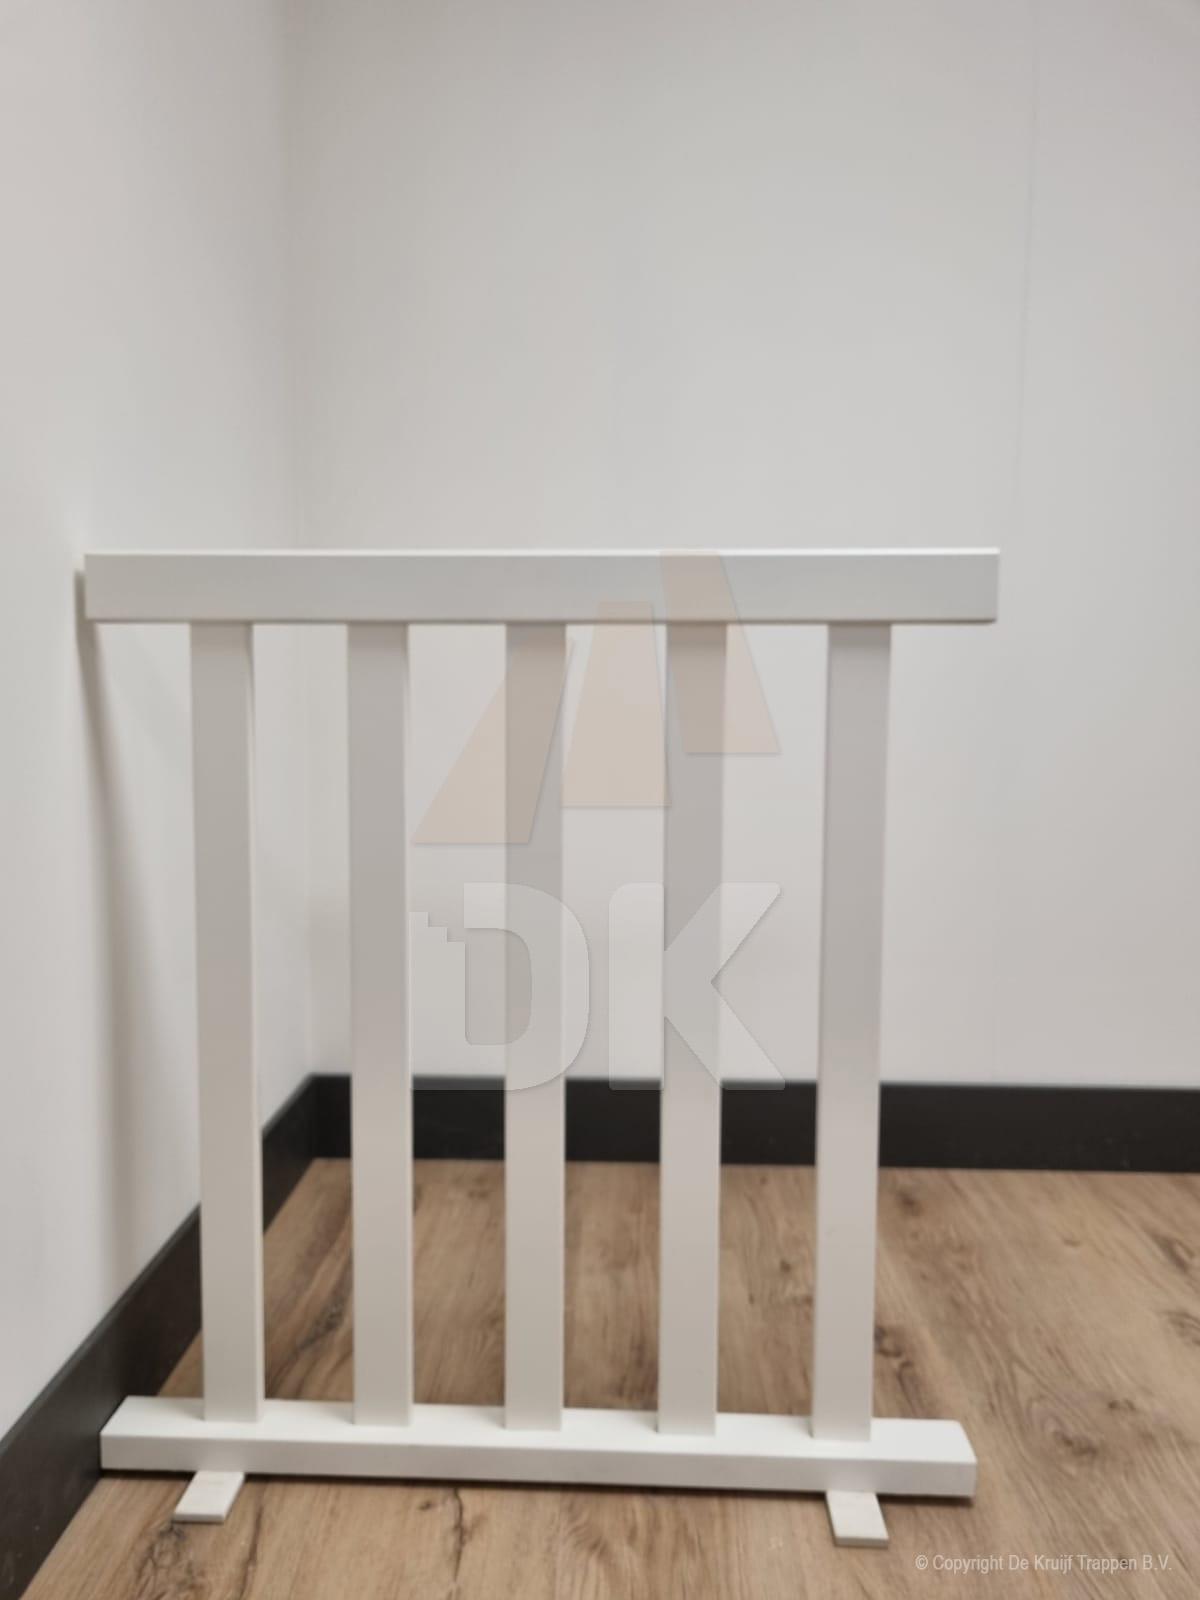 Balustrade houten spijlen - H1001